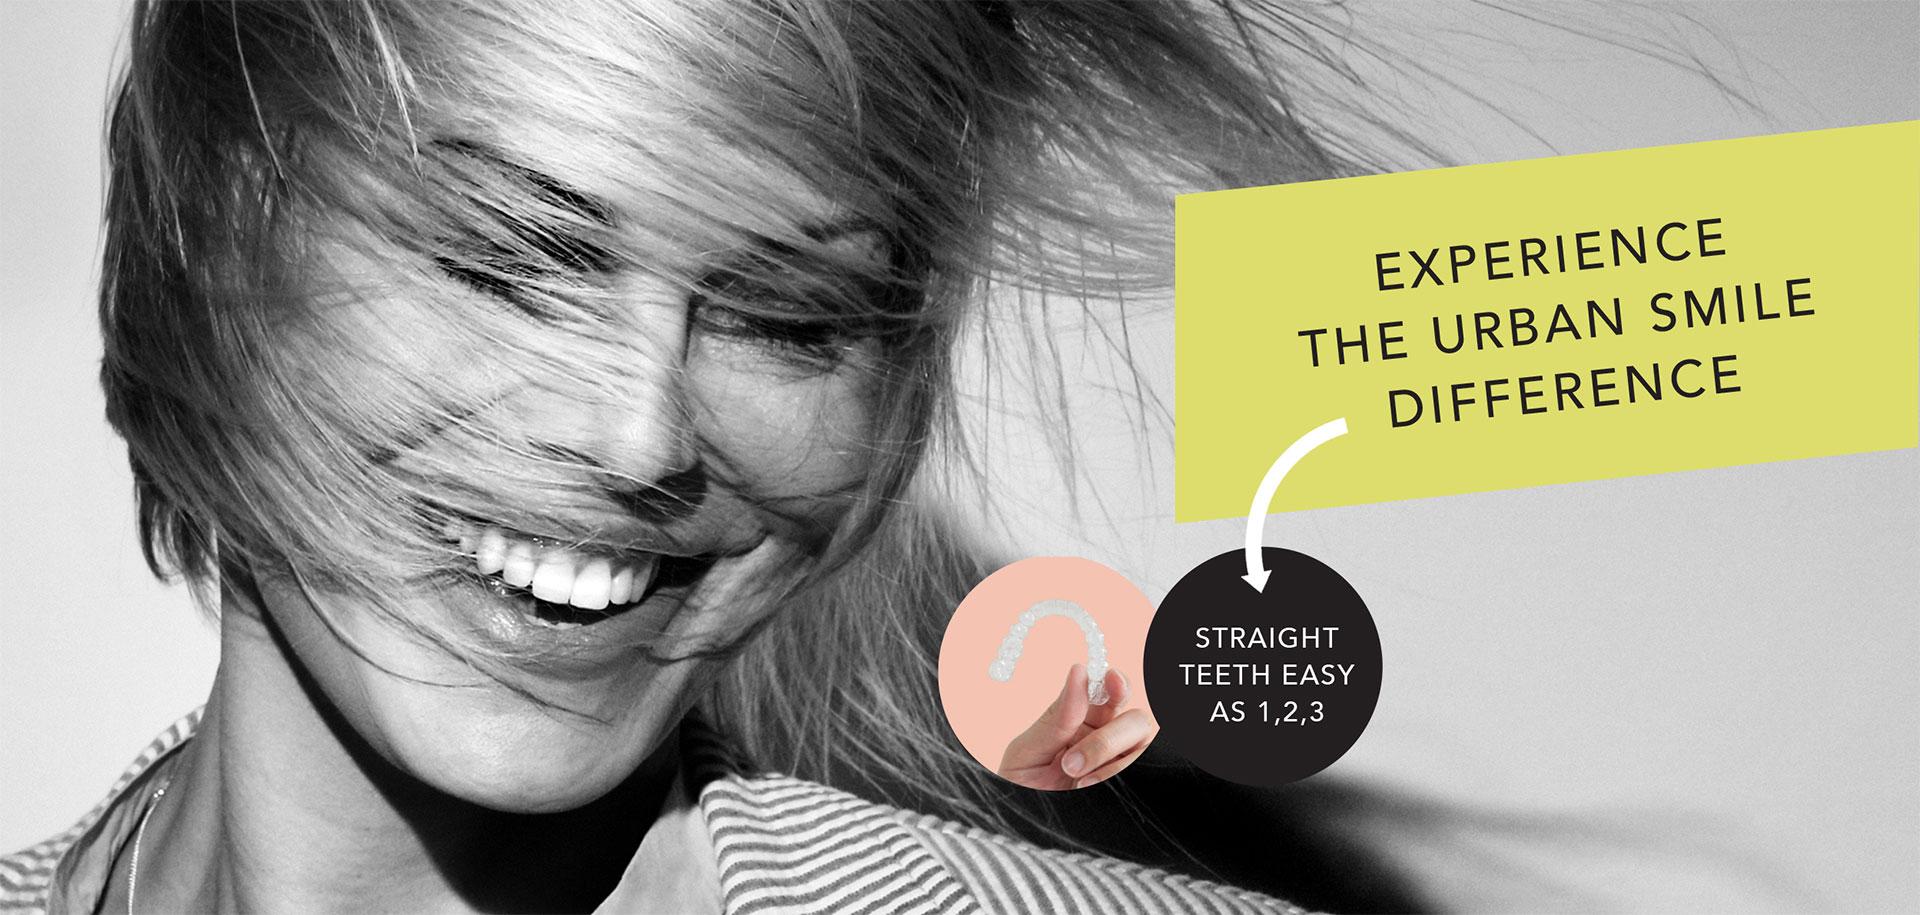 Straight teeth easy as 1,2,3